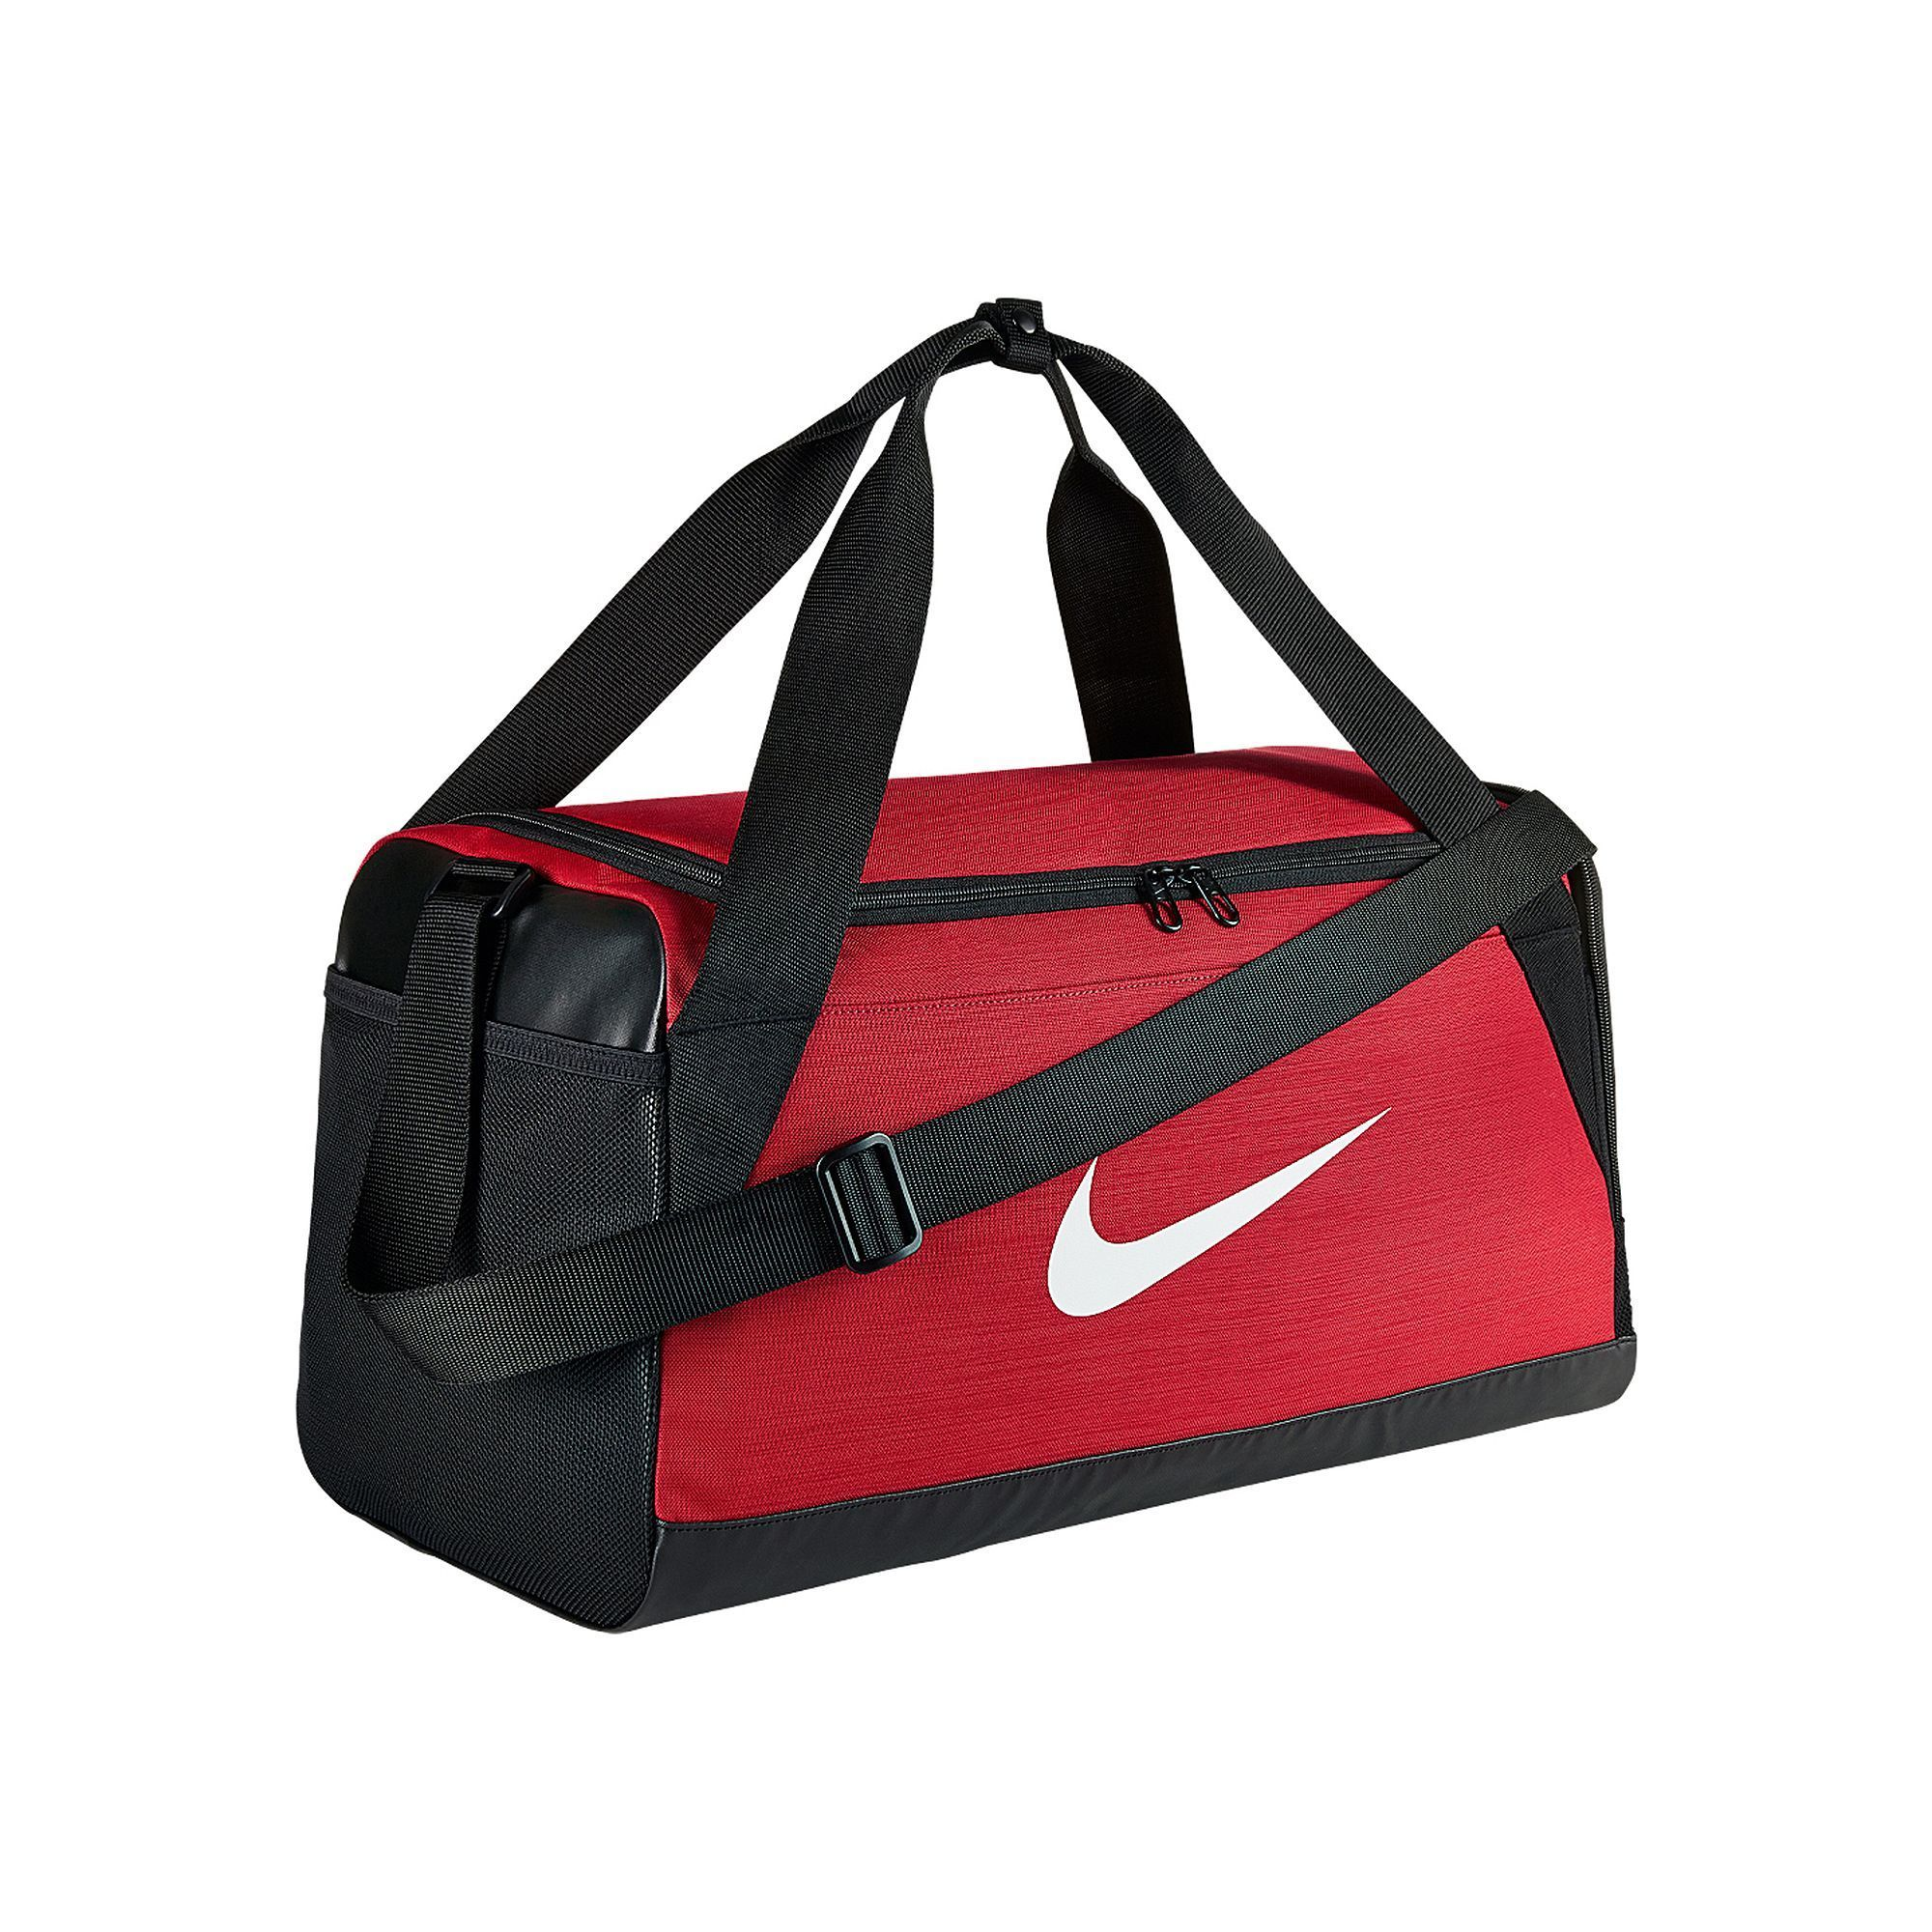 Nike Brasilia 7 Small Duffel Bag  8960c1487ce85